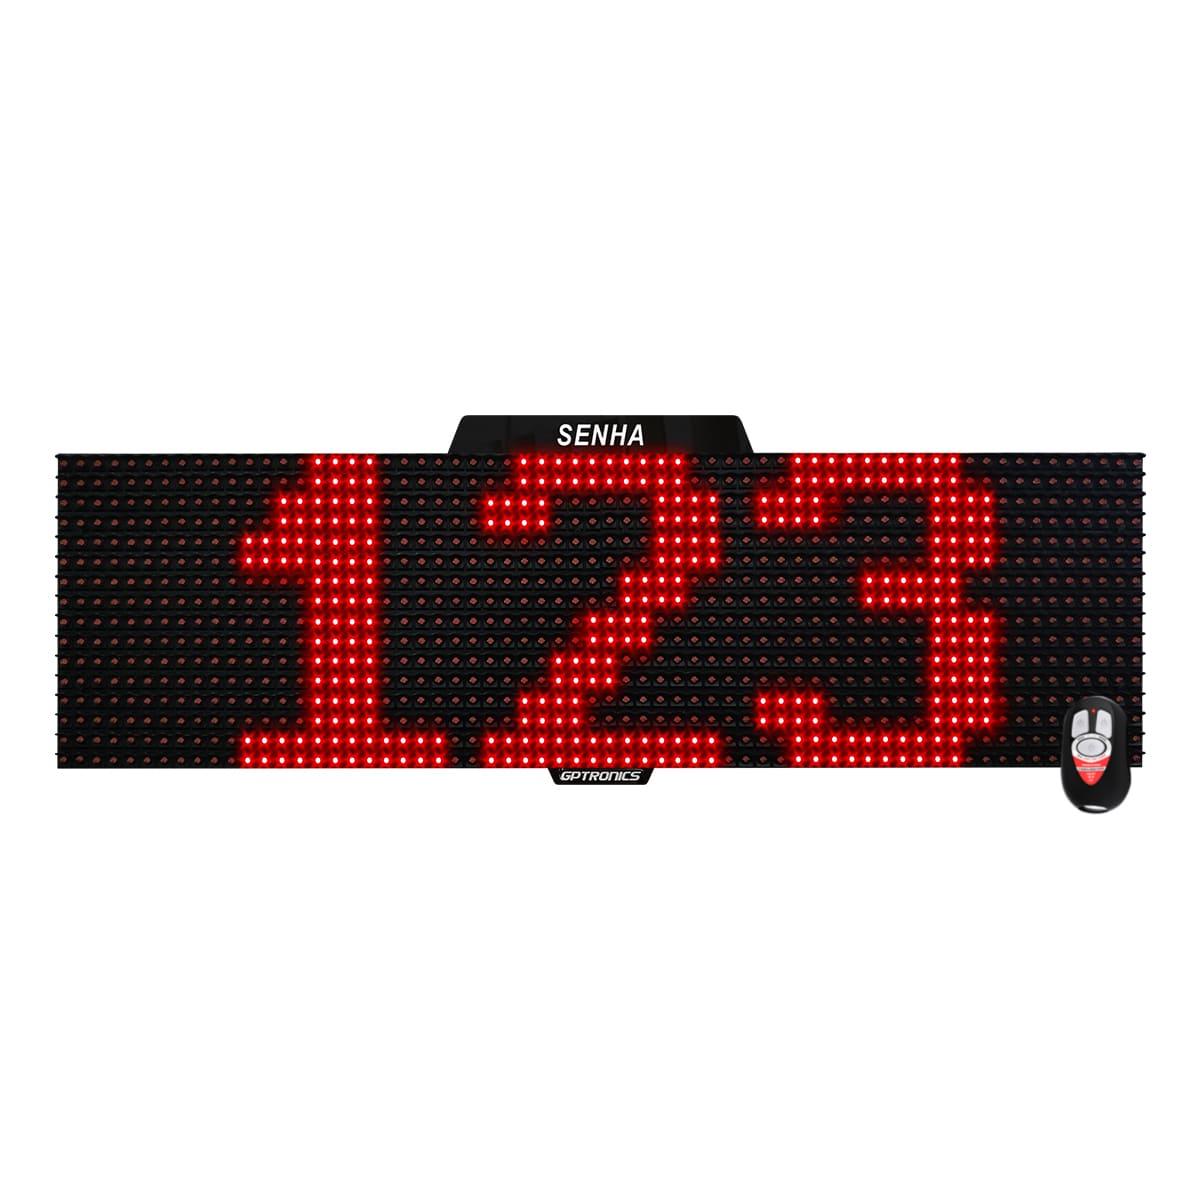 Agilize Full S - Painel de Senhas com Mensagem - 64x16x4cm